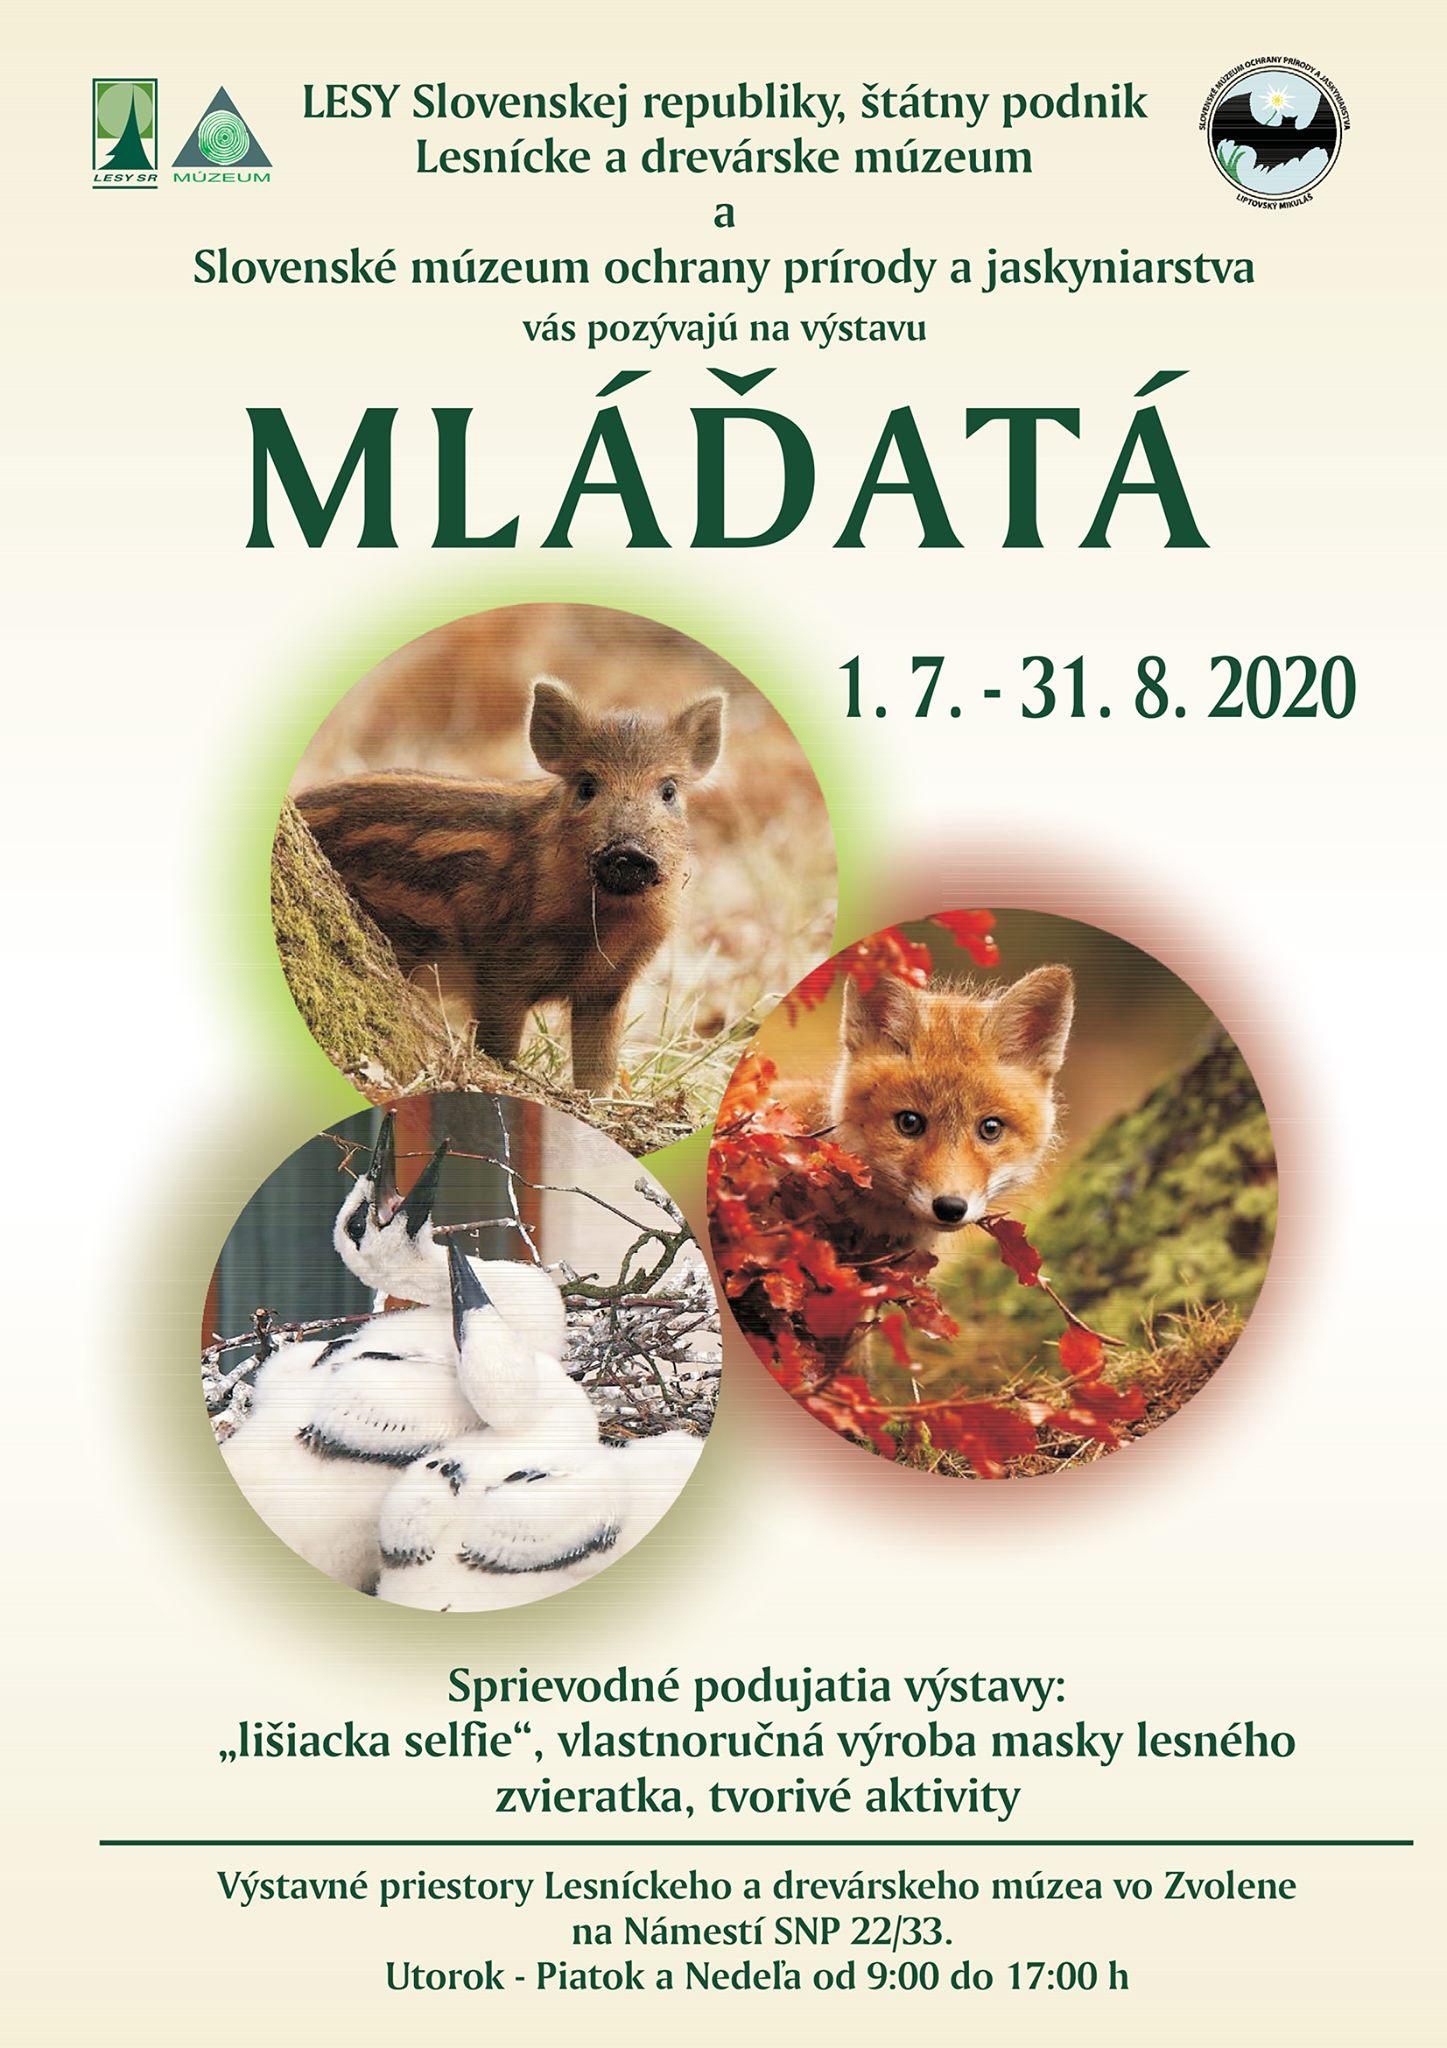 mladata-ldm-zv-plagat-2020